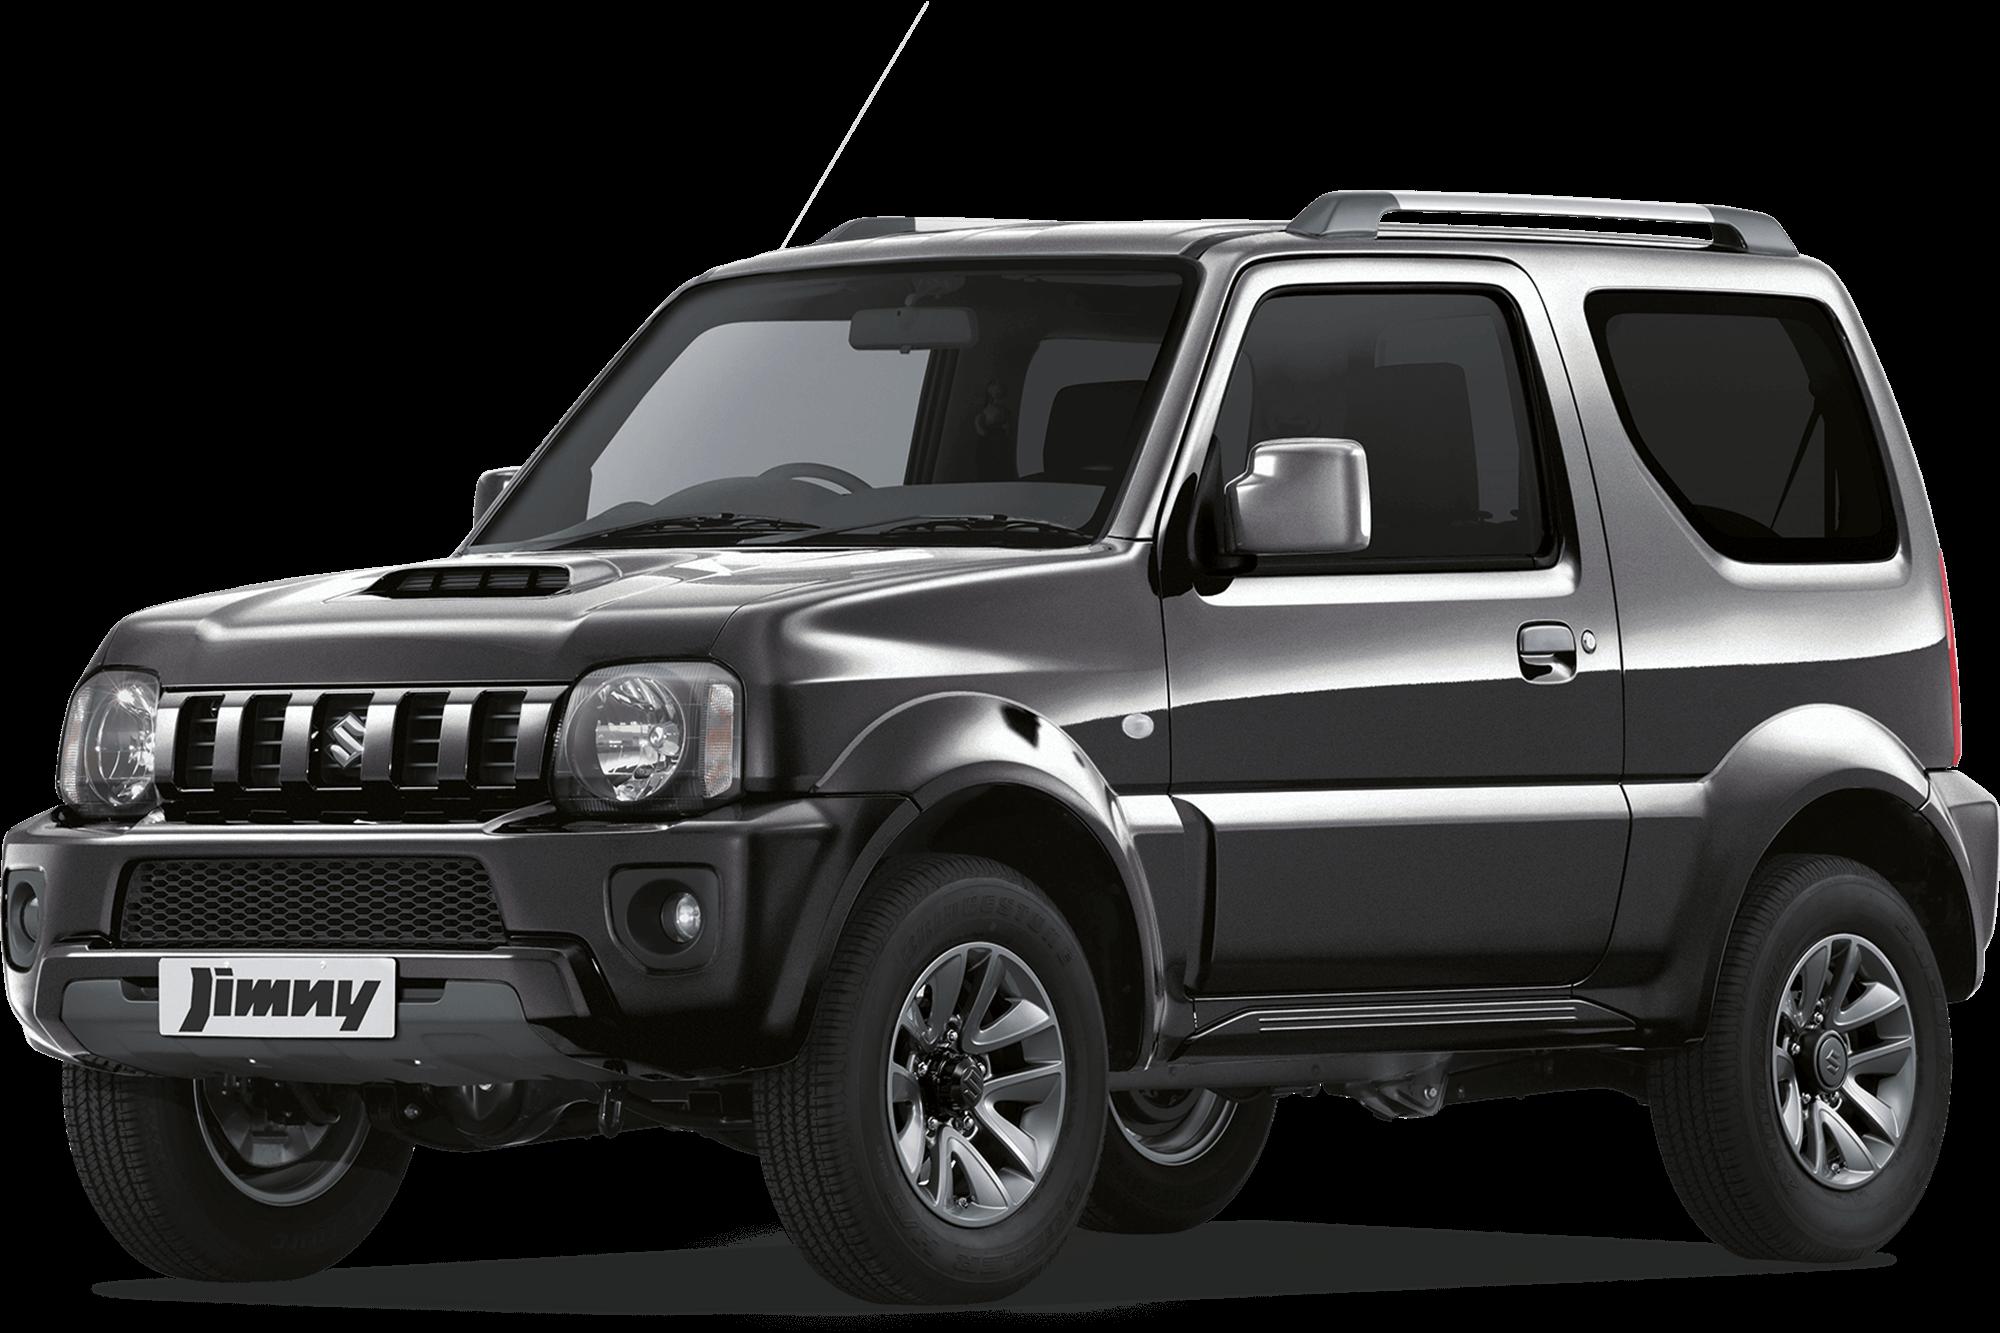 Suzuki jimny 1300cc